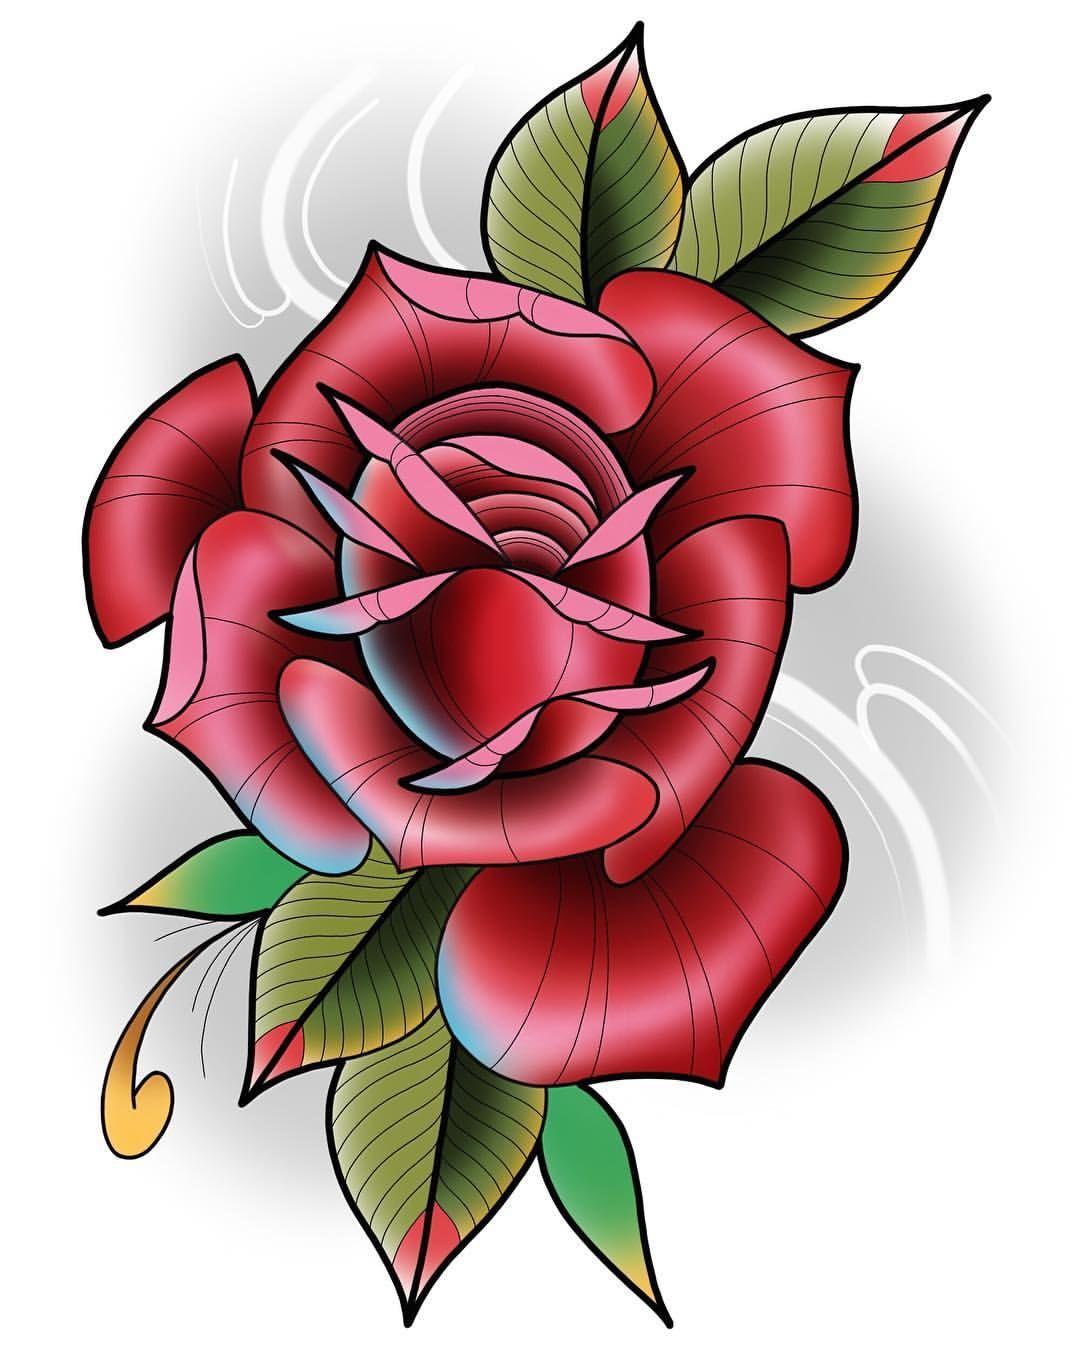 Neotraditional rose by darin blank instagram darinblanktattoos my artwork pinterest - Dessin de rose ...